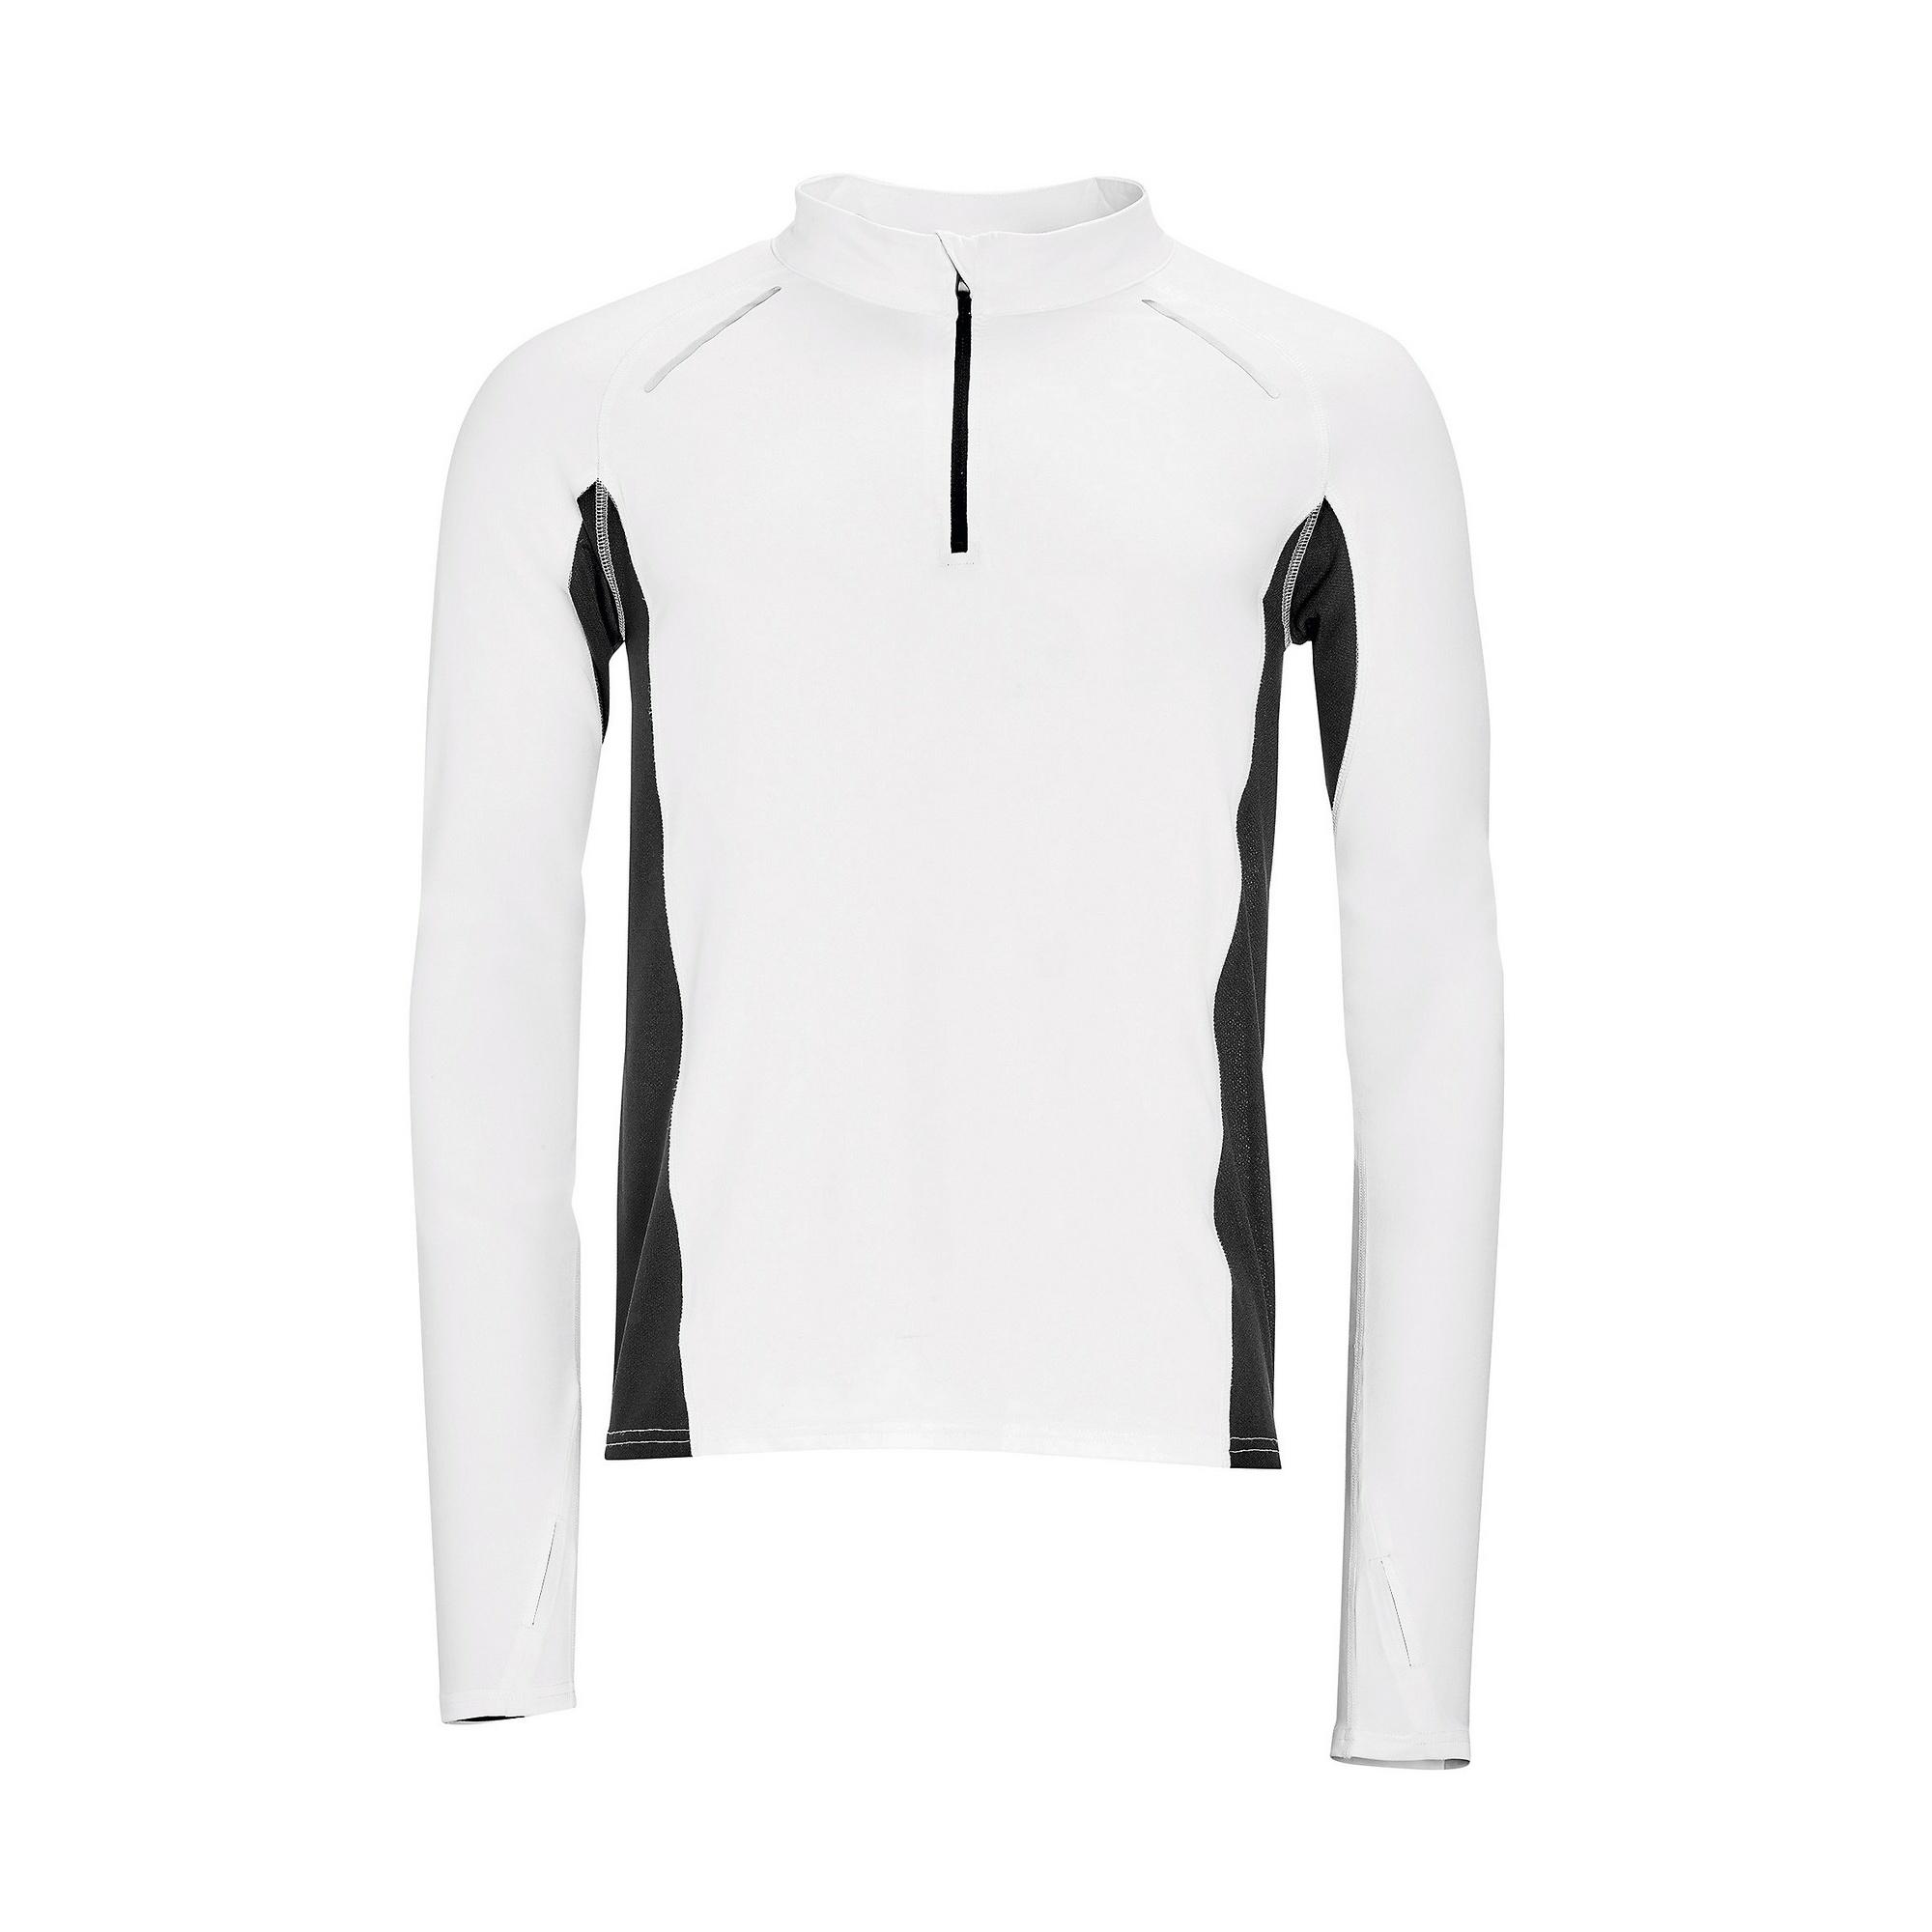 SOLS-Camiseta-de-manga-larga-modelo-Berling-para-hombre